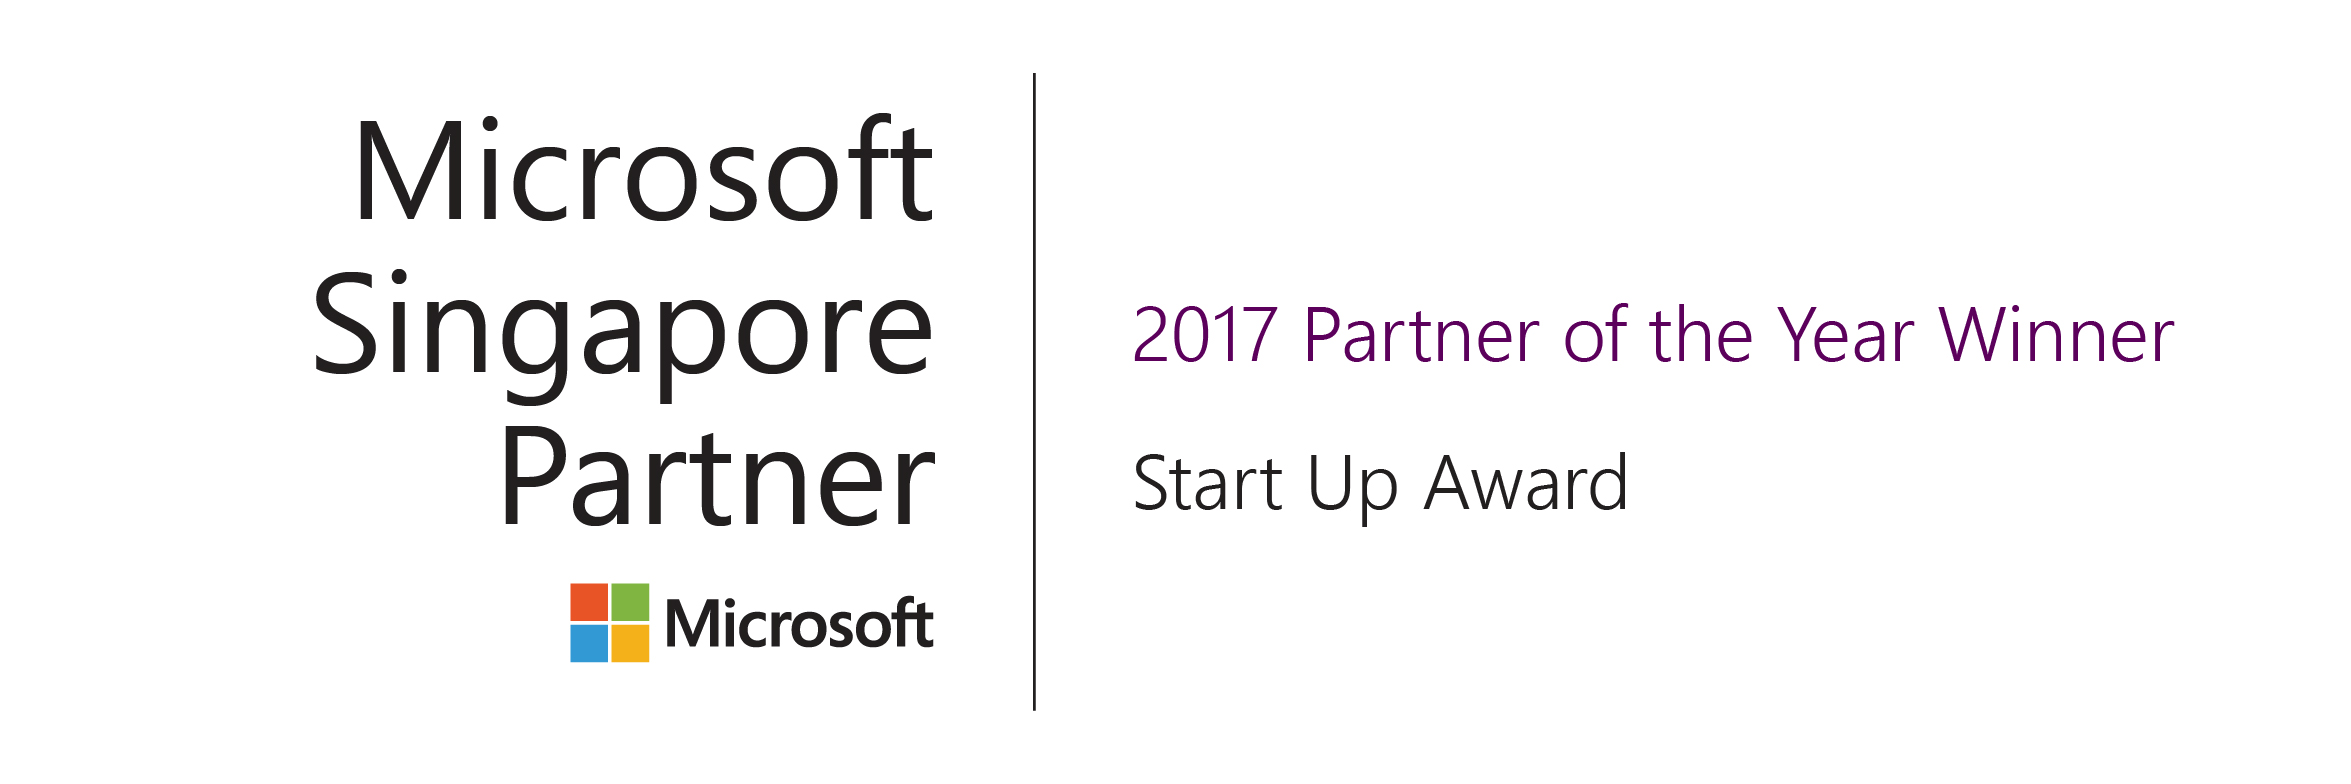 microsoft-partner-awards